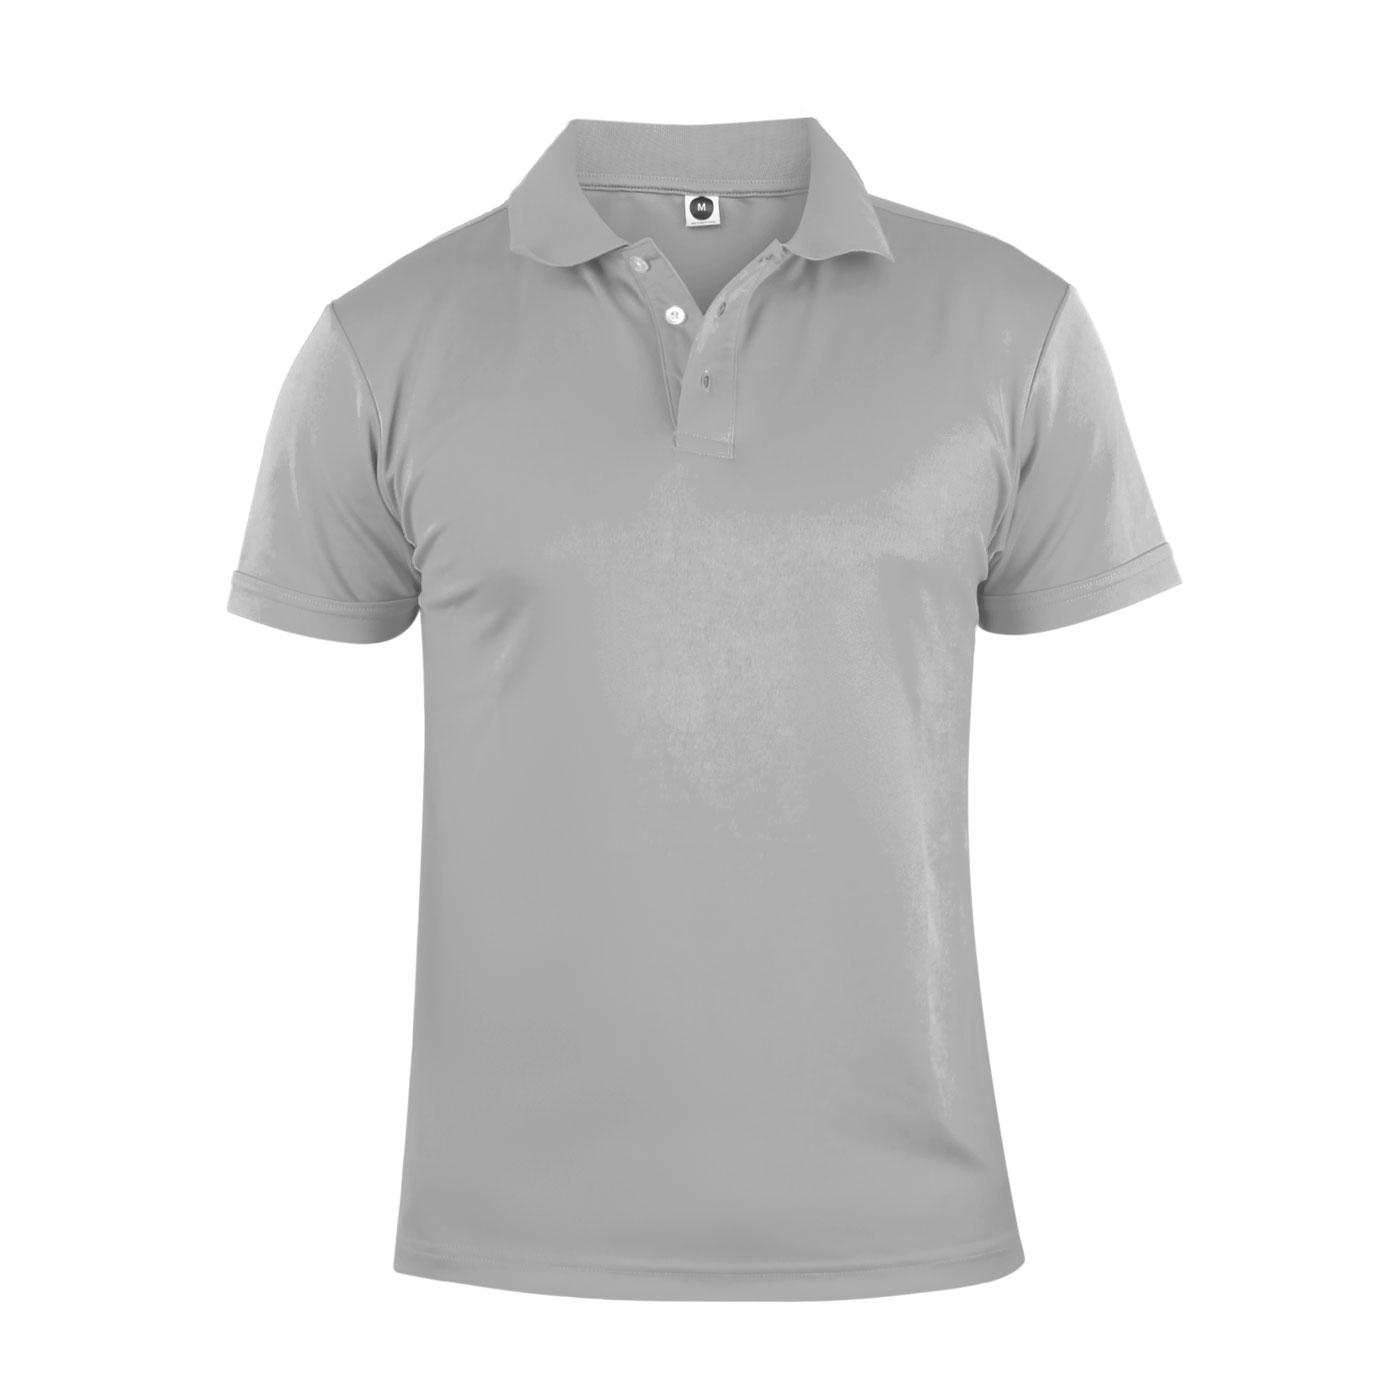 HODARLA 彈力涼感短袖POLO衫 3113901 - 淺灰